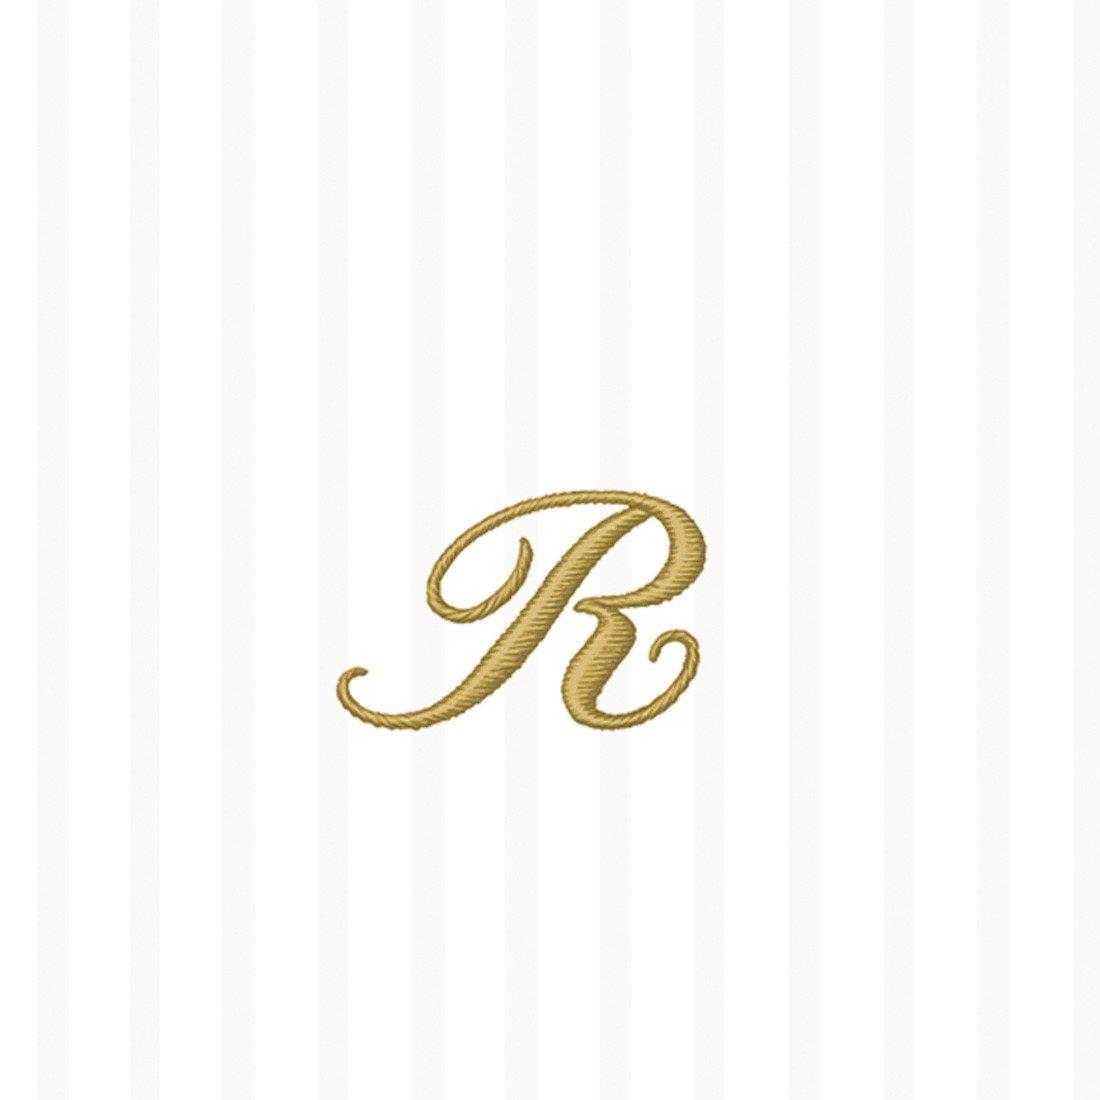 Ideal Home Range 20-Count 3-Ply Paper Stripes Again Monogram Cocktail Napkins, R, Ivory Stripe